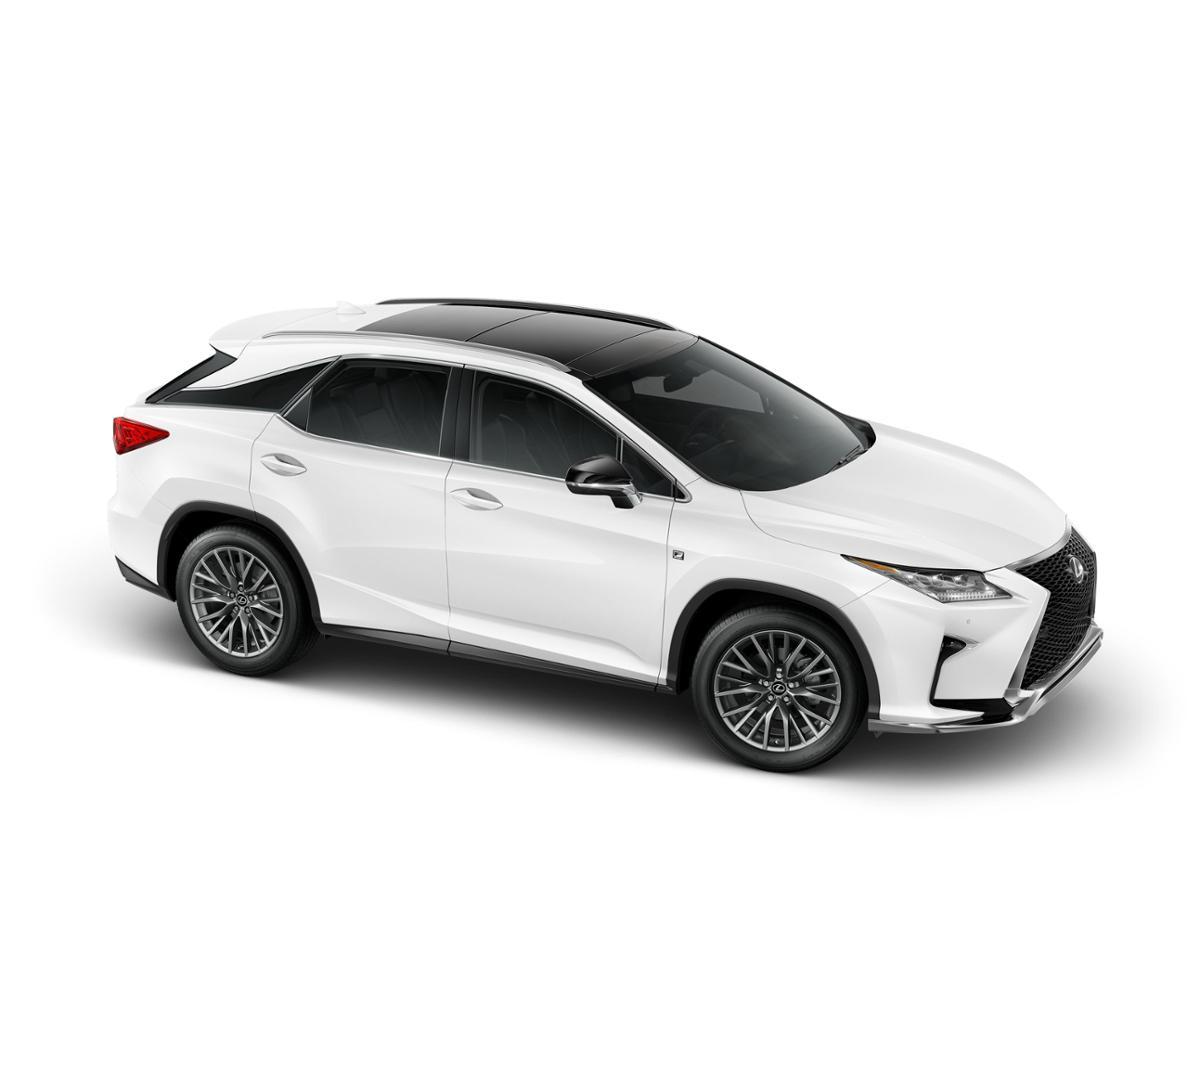 2014 Lexus Is F Sport For Sale: 2017 Ultra White F SPORT Lexus RX 350 For Sale In Colma